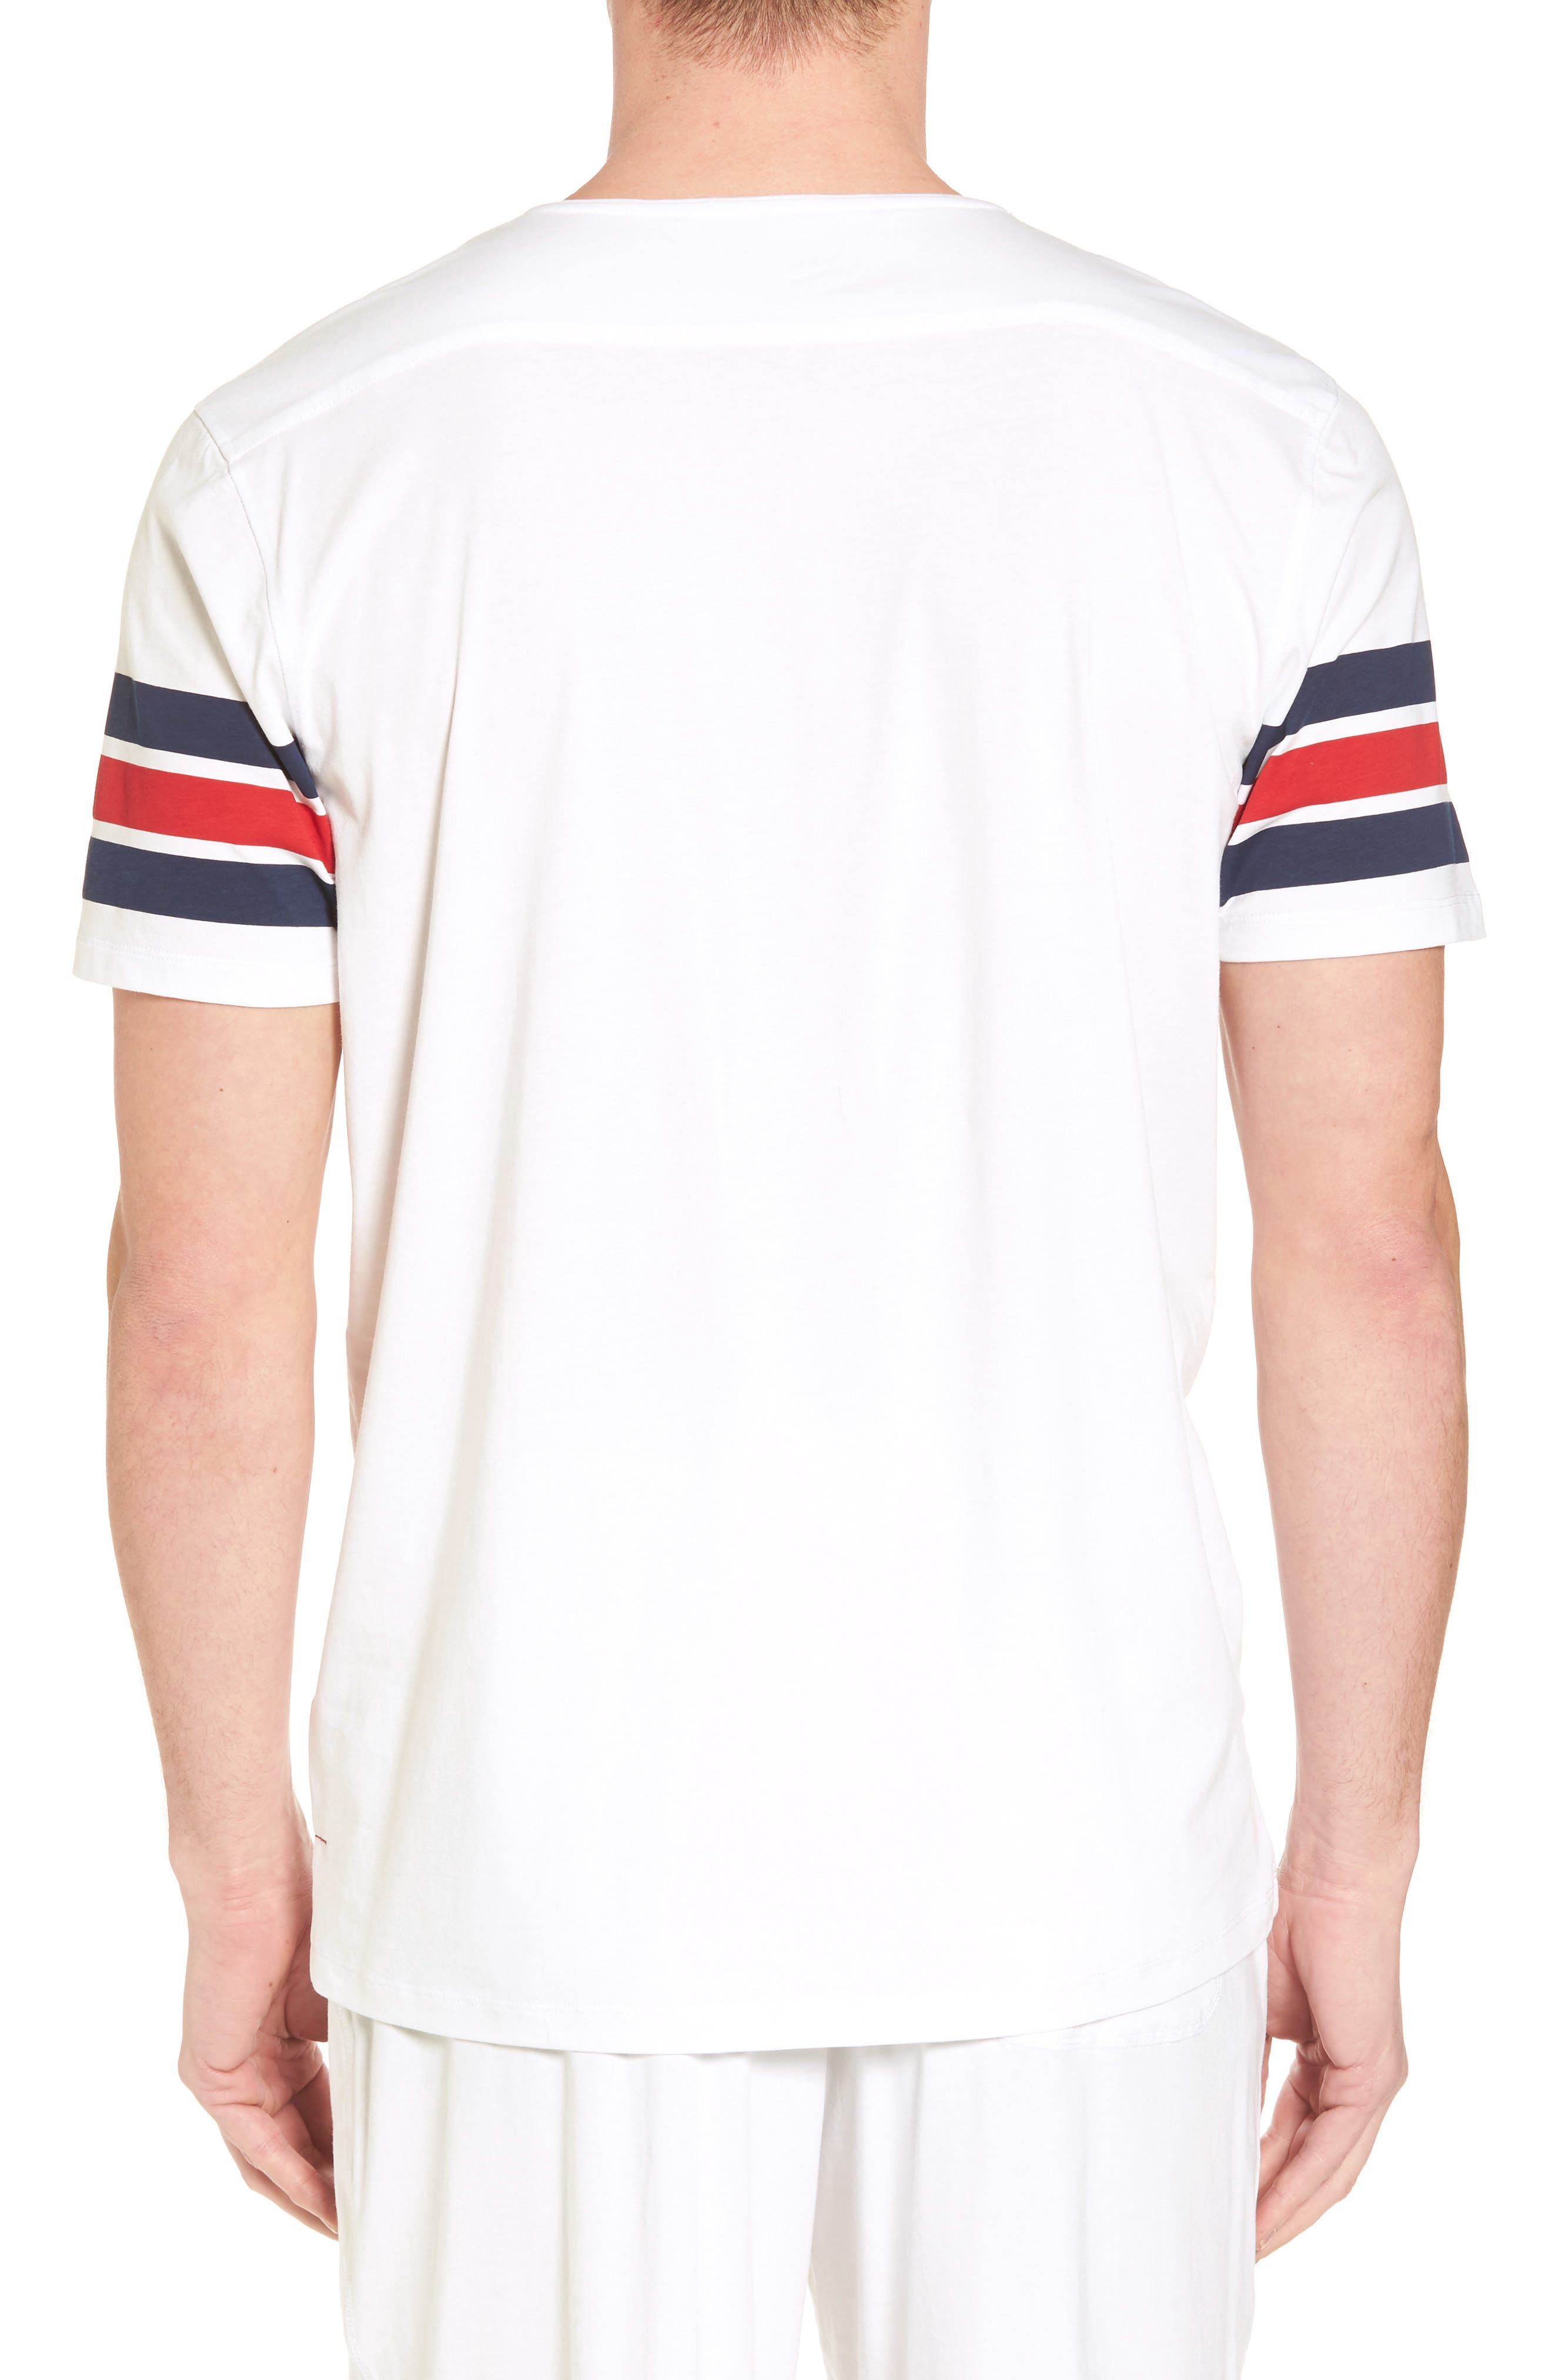 V-Neck Stretch Cotton Blend T-Shirt,                             Alternate thumbnail 2, color,                             Red/ Navy